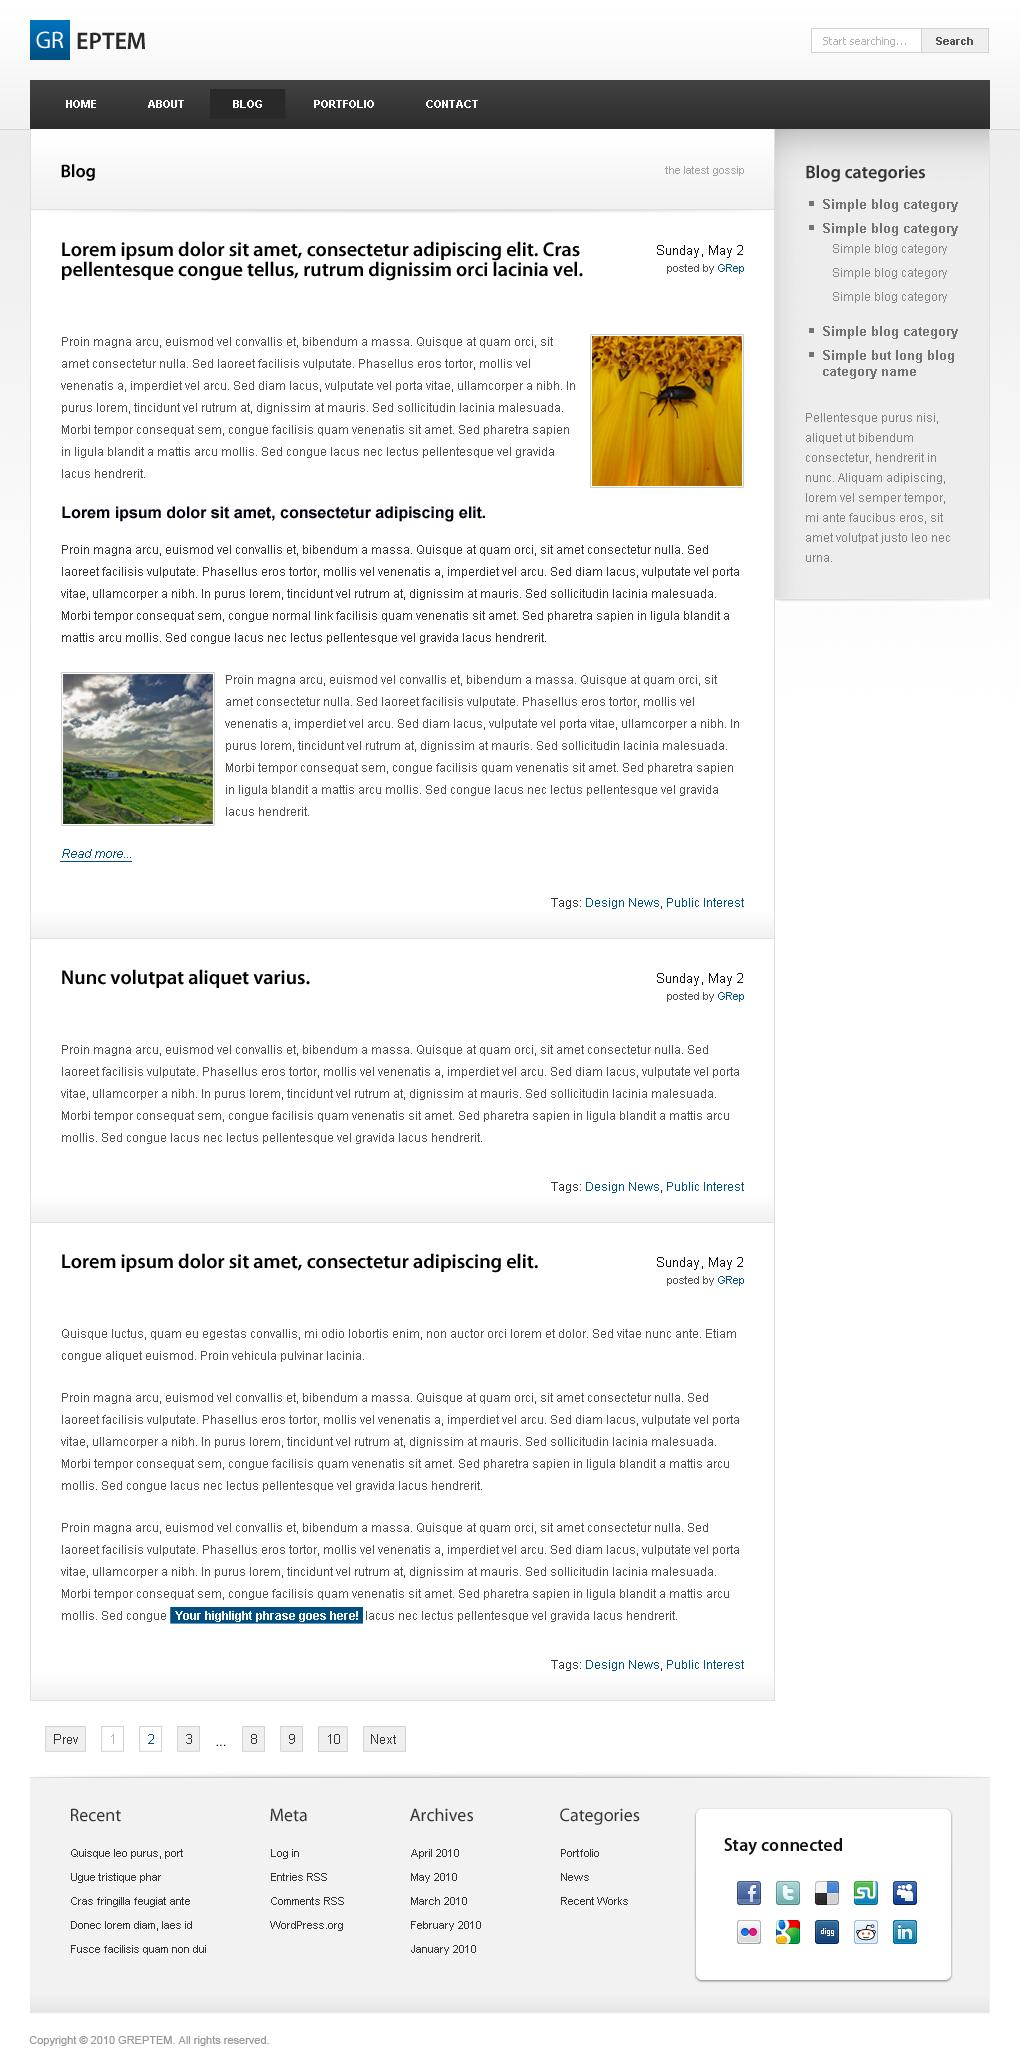 GREPTEM - Business & Portfolio Wordpress Theme